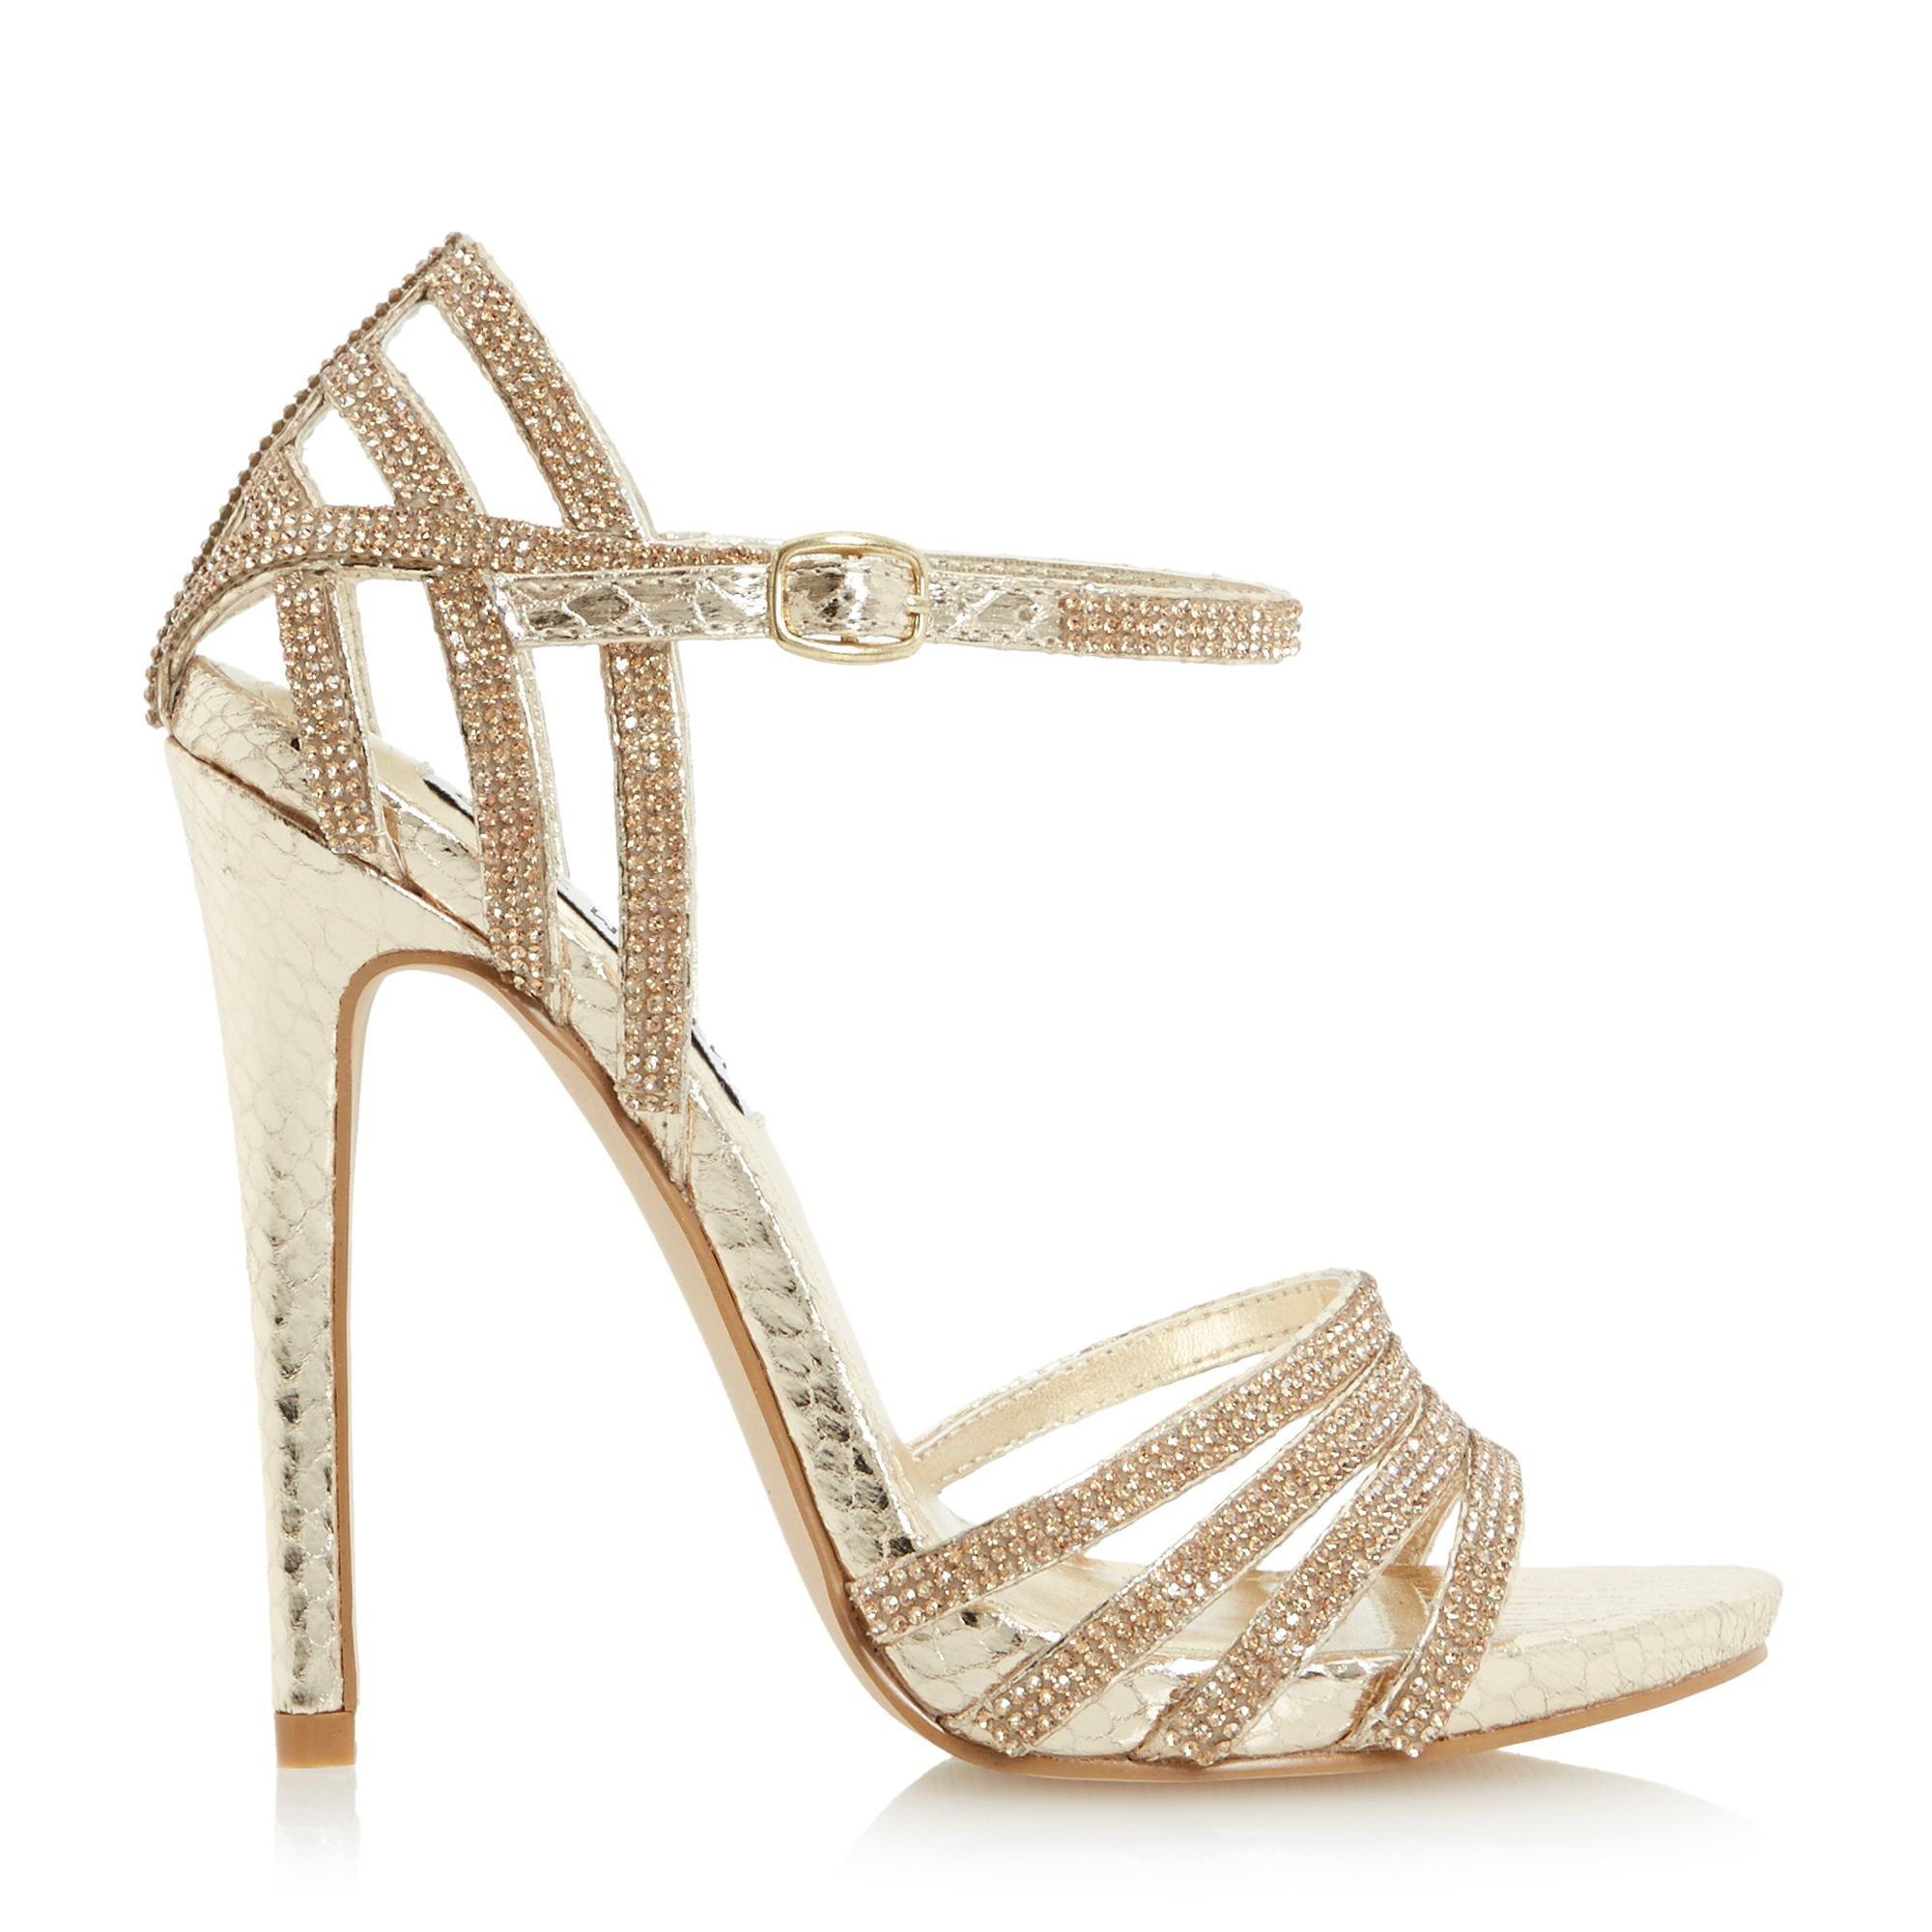 steve madden cagged diamante strappy high heel sandal in. Black Bedroom Furniture Sets. Home Design Ideas